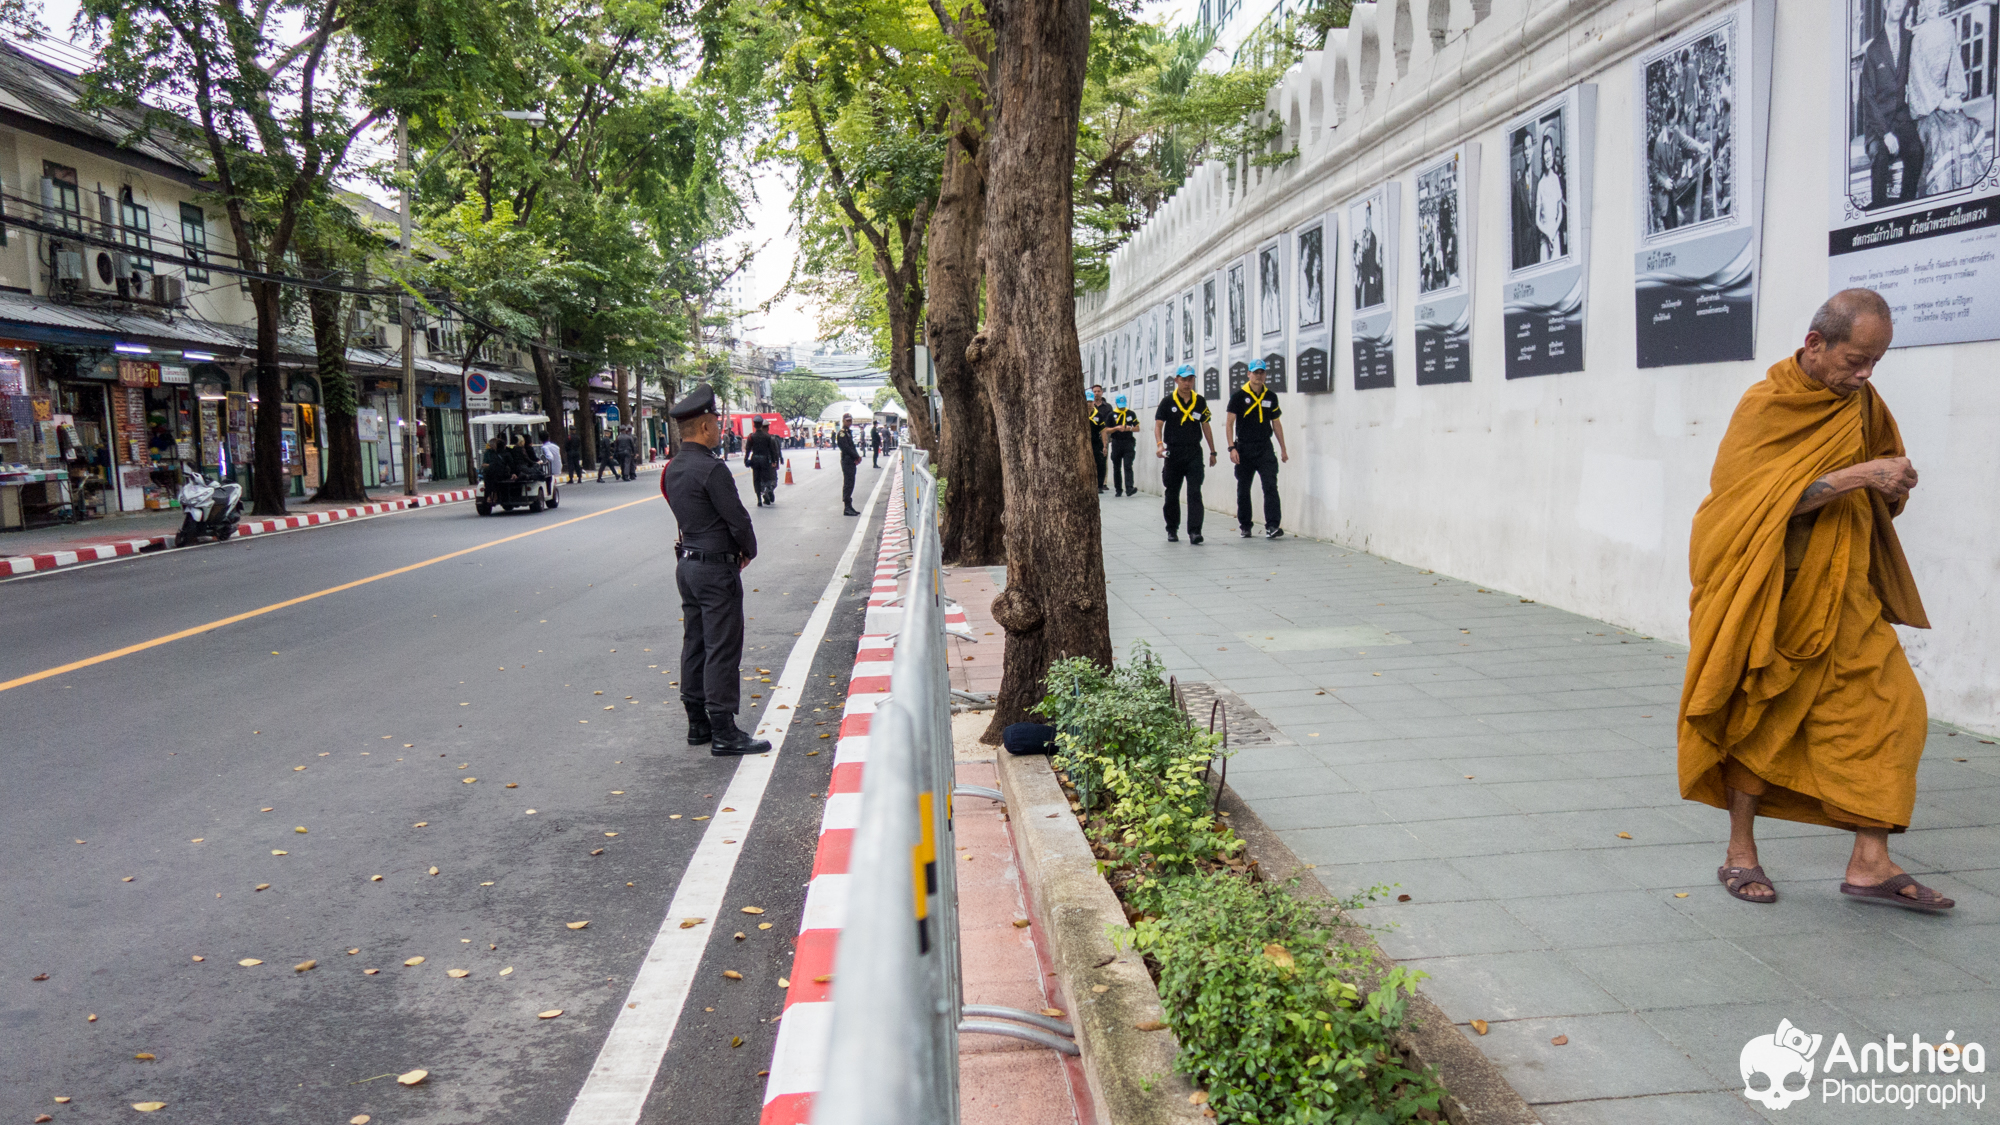 Before cremation of the king bangkok